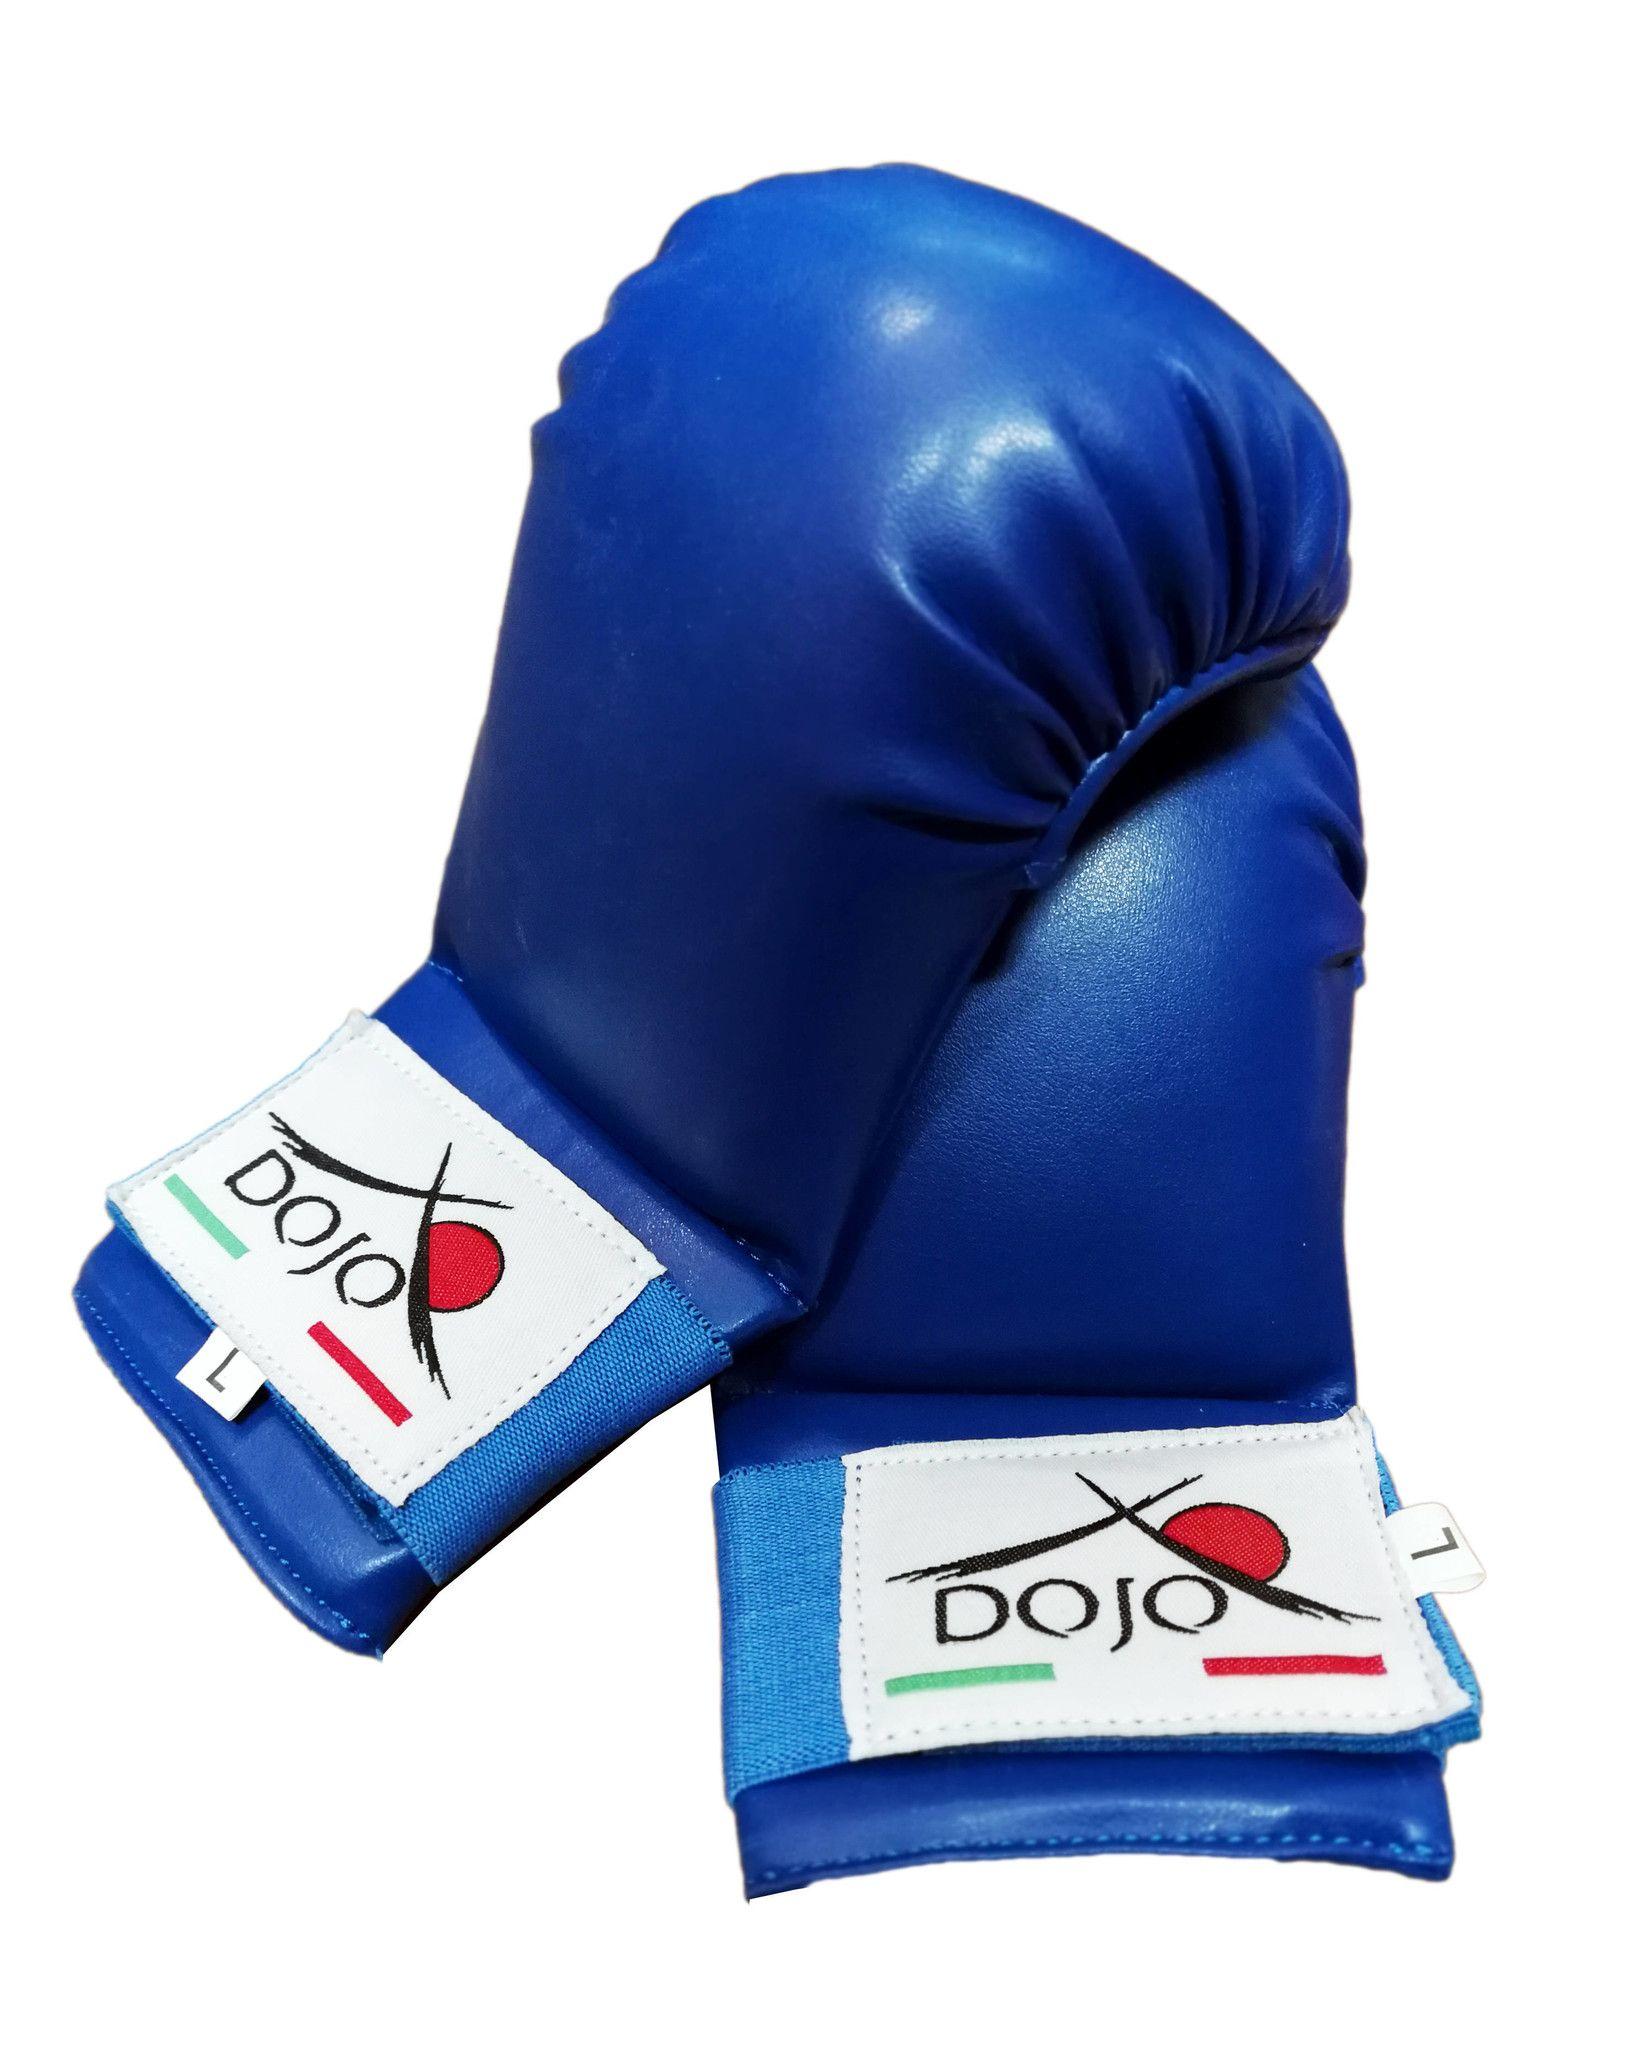 Dojo - Guantini per karate Blu training